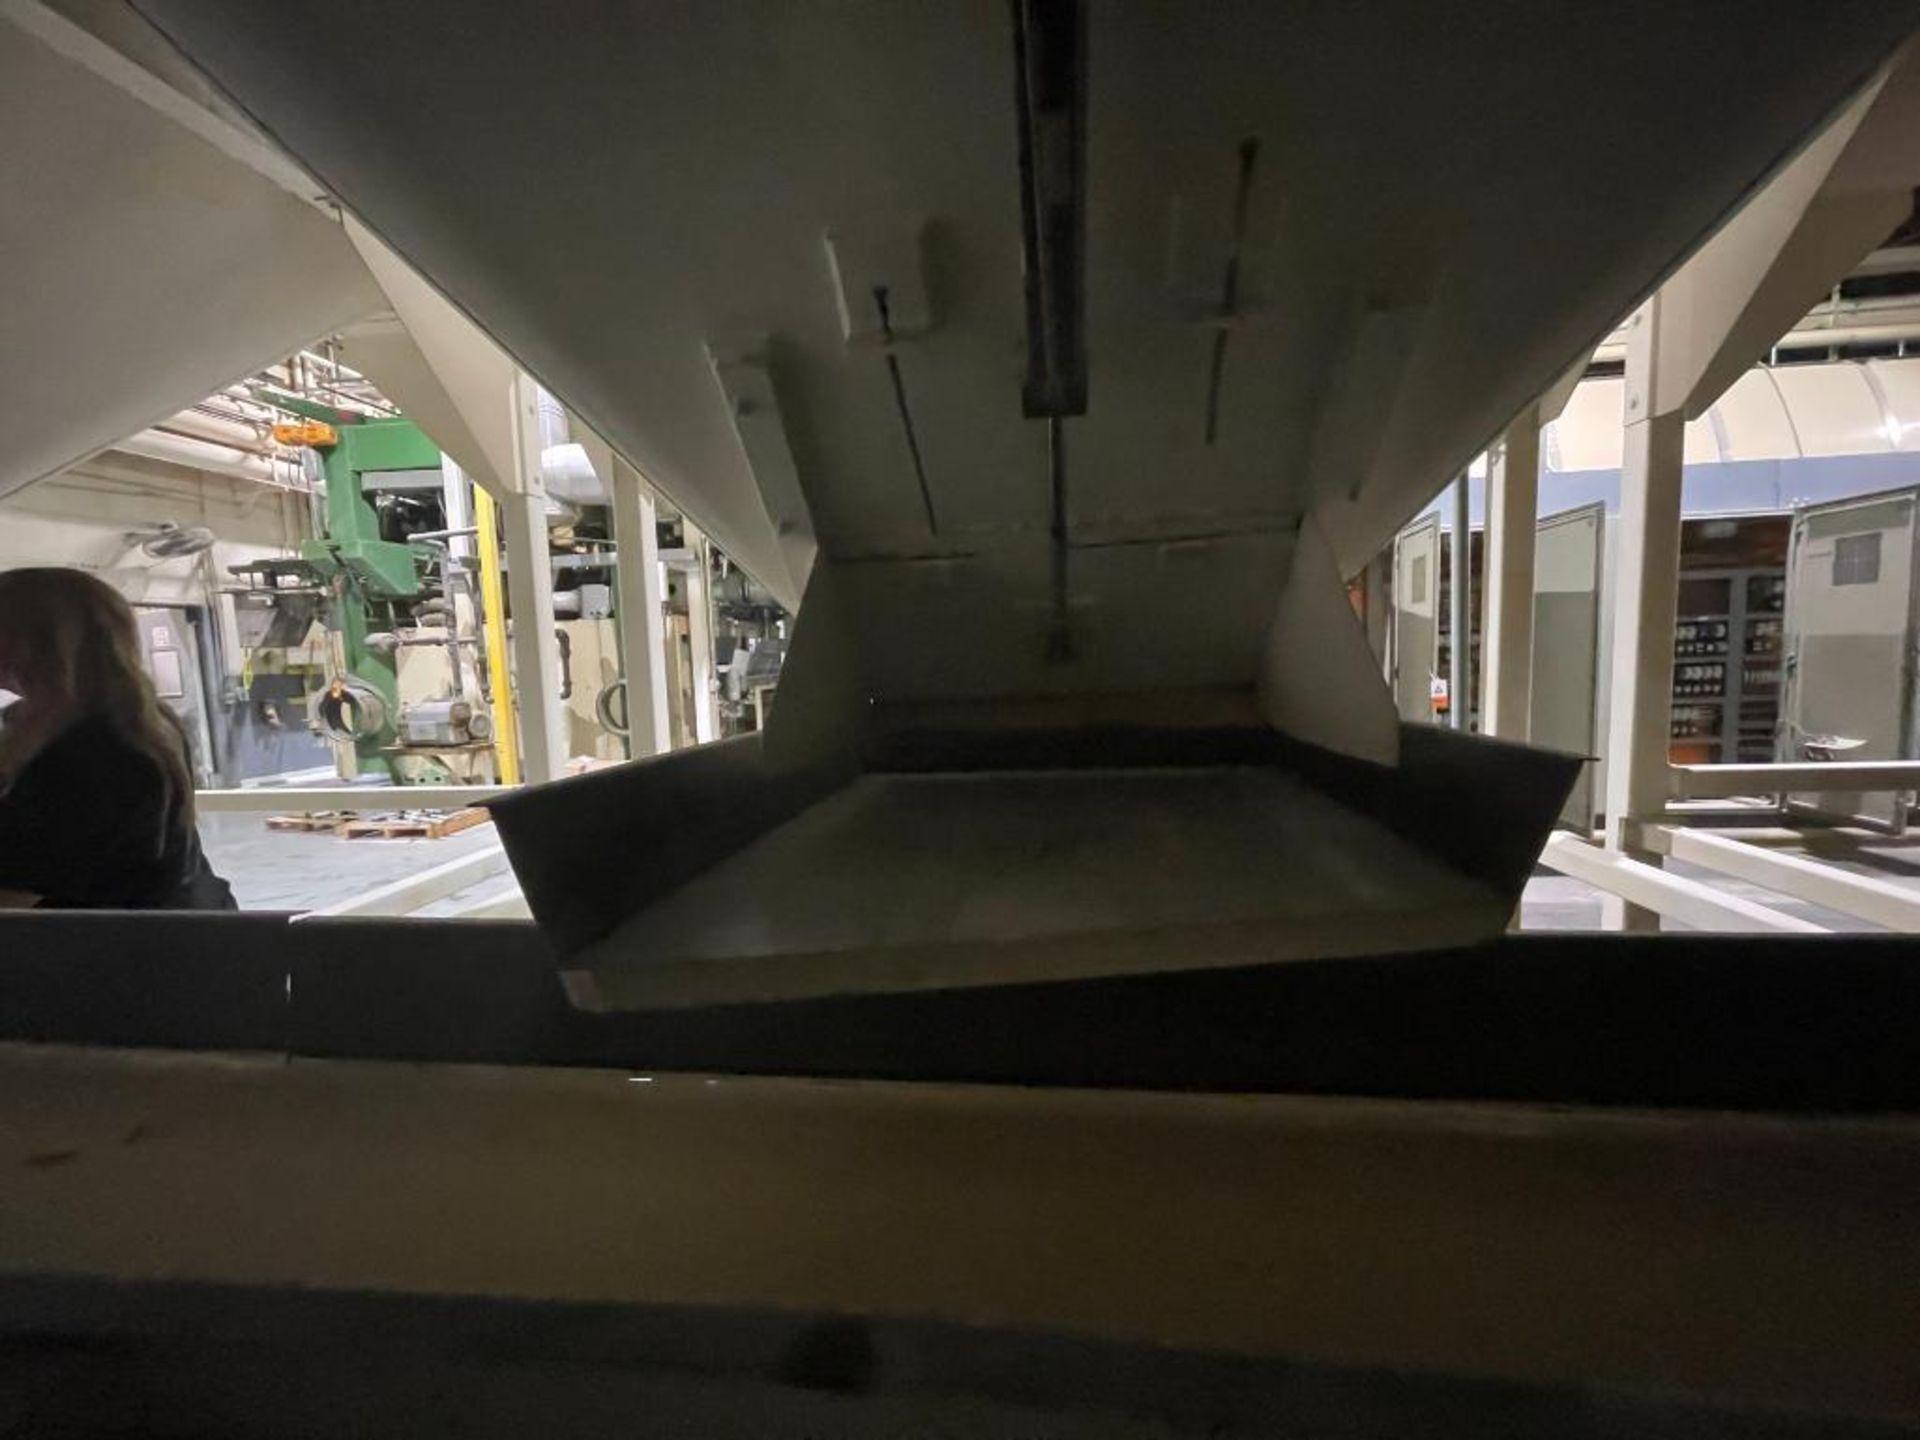 Aseeco mild steel cone bottom bulk storage bin - Image 17 of 31